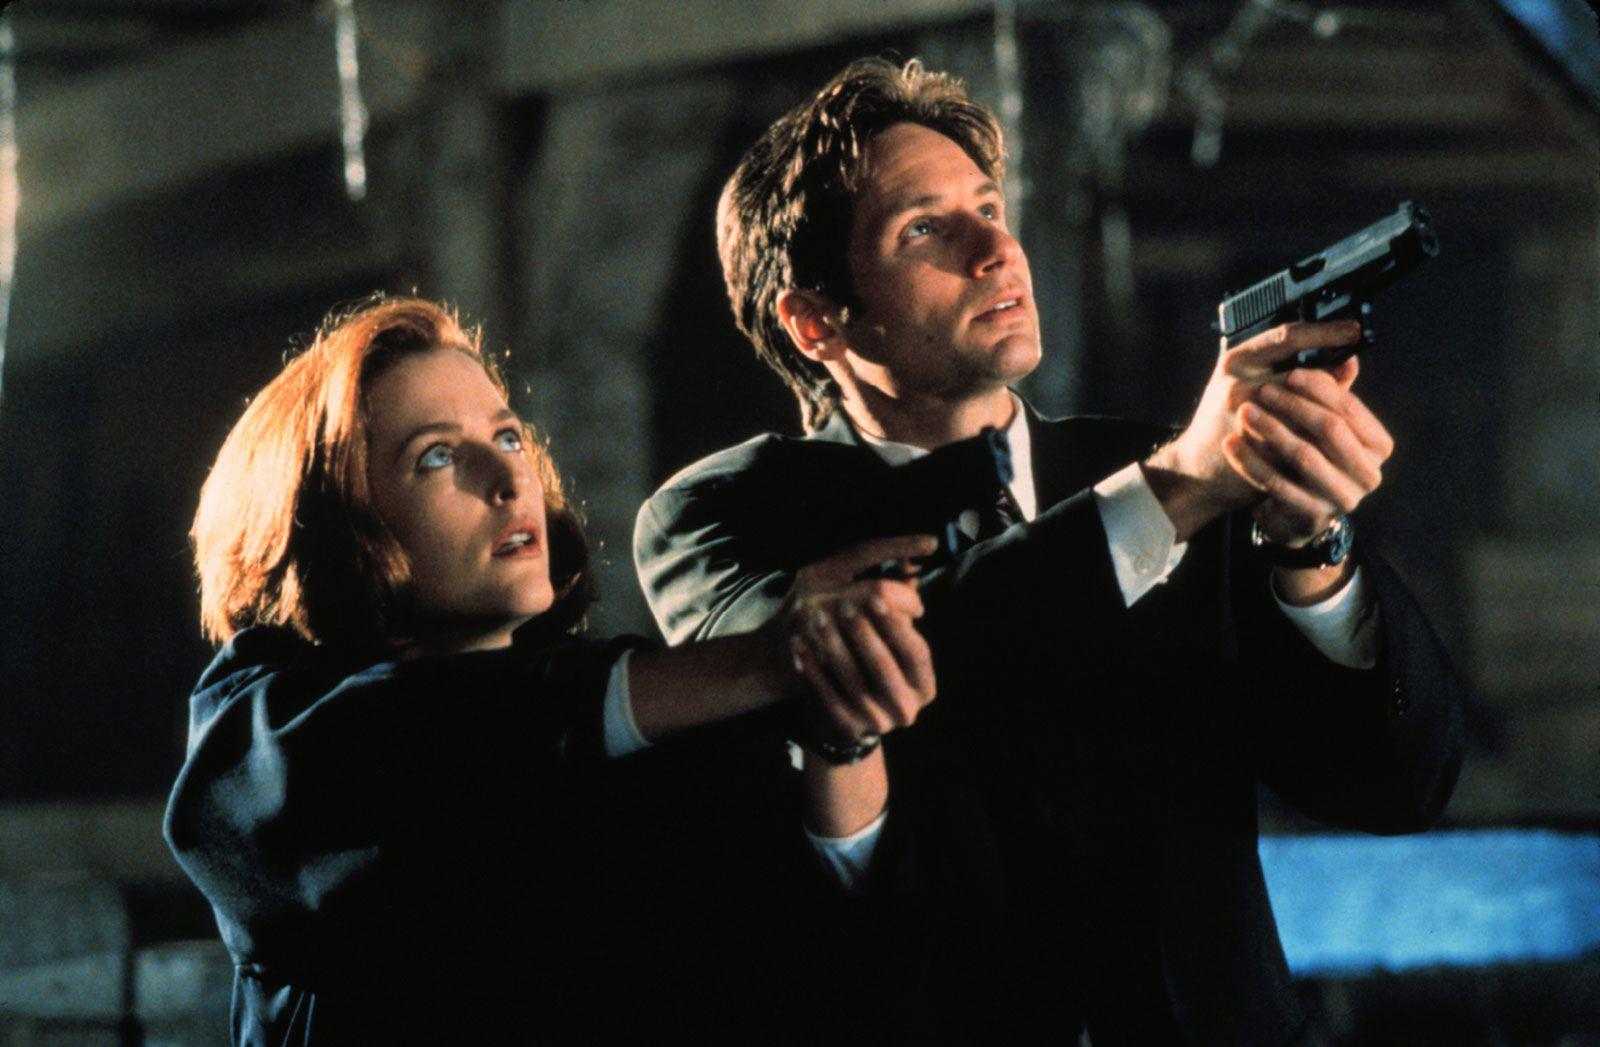 Gillian-Anderson-David-Duchovny-The-X-Files.jpg